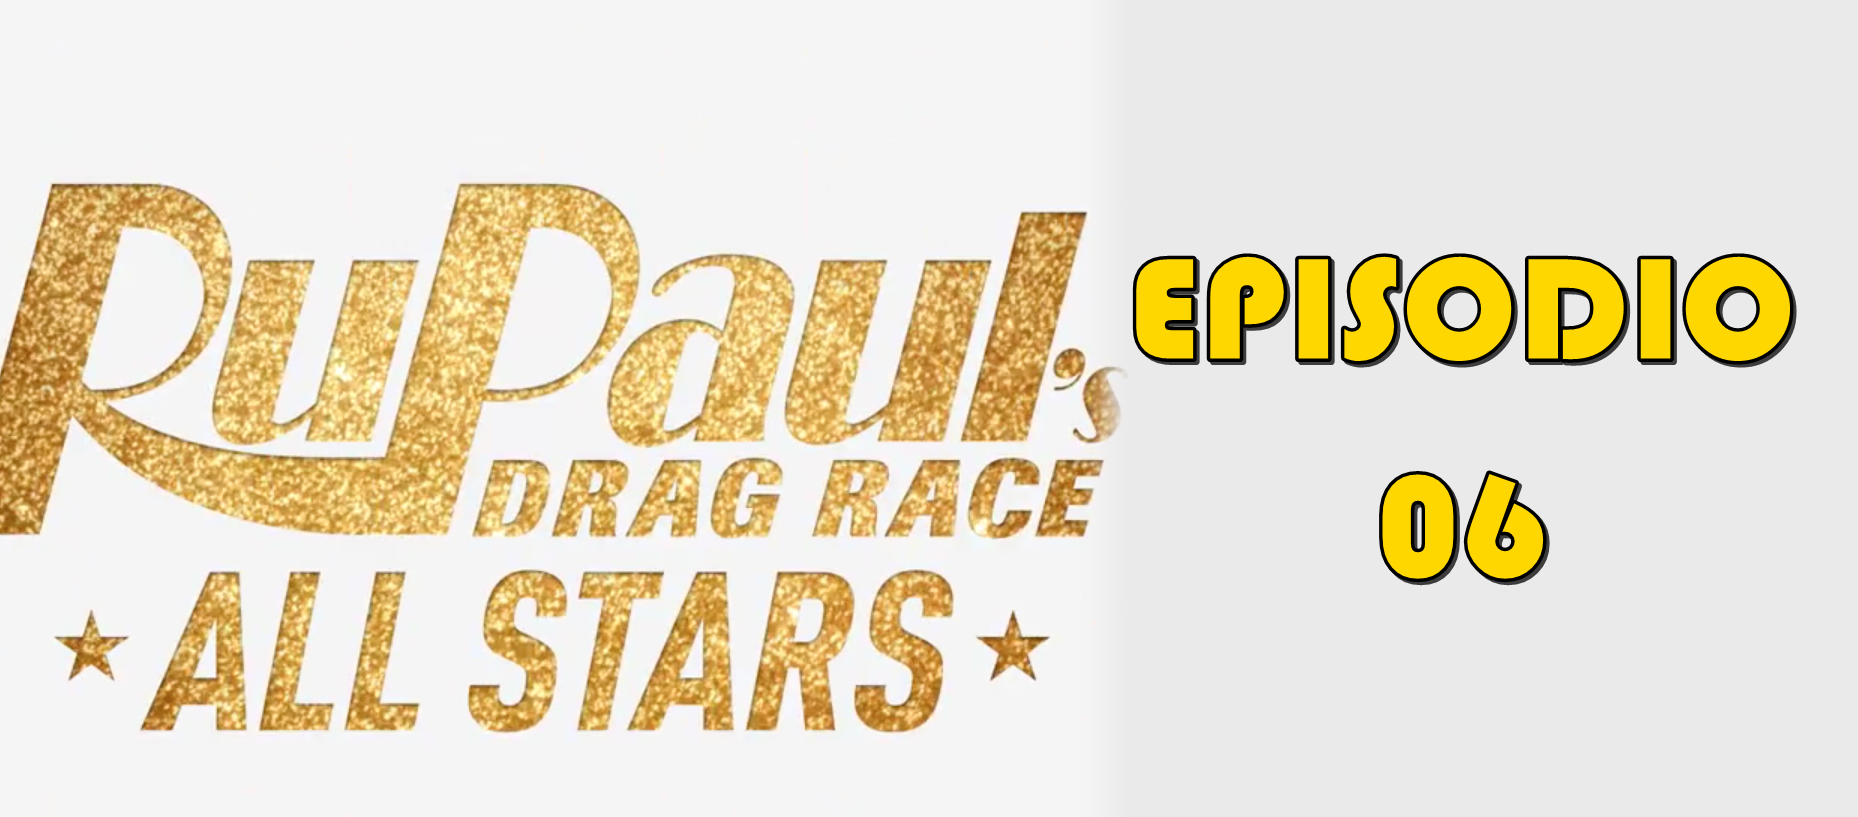 Rupaul´s Drag Race All Stars 3 Episodio 06